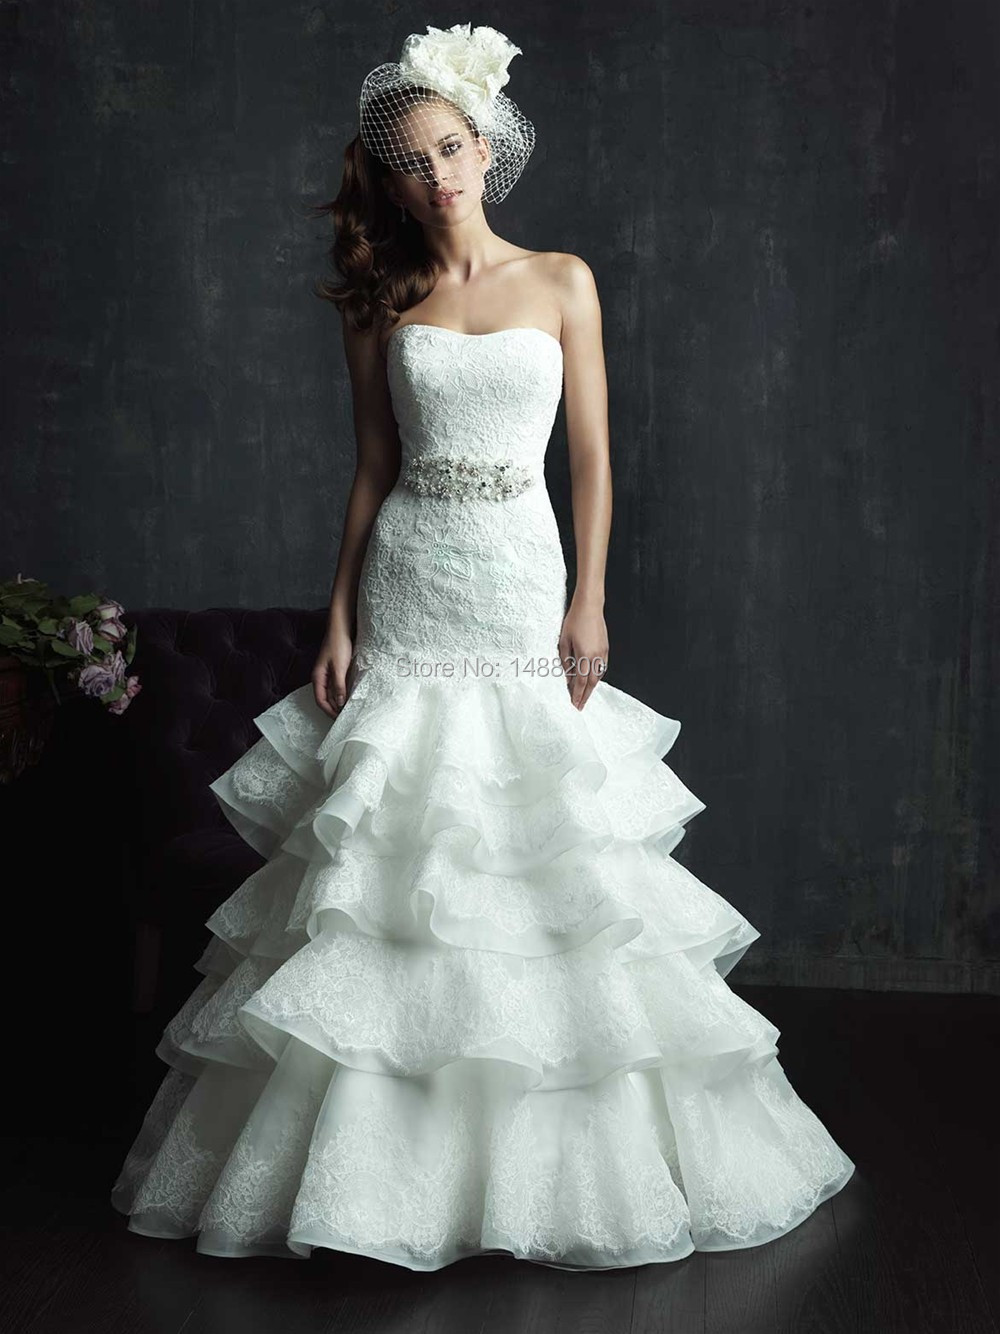 vestido de noiva para corpo triangulo invertido